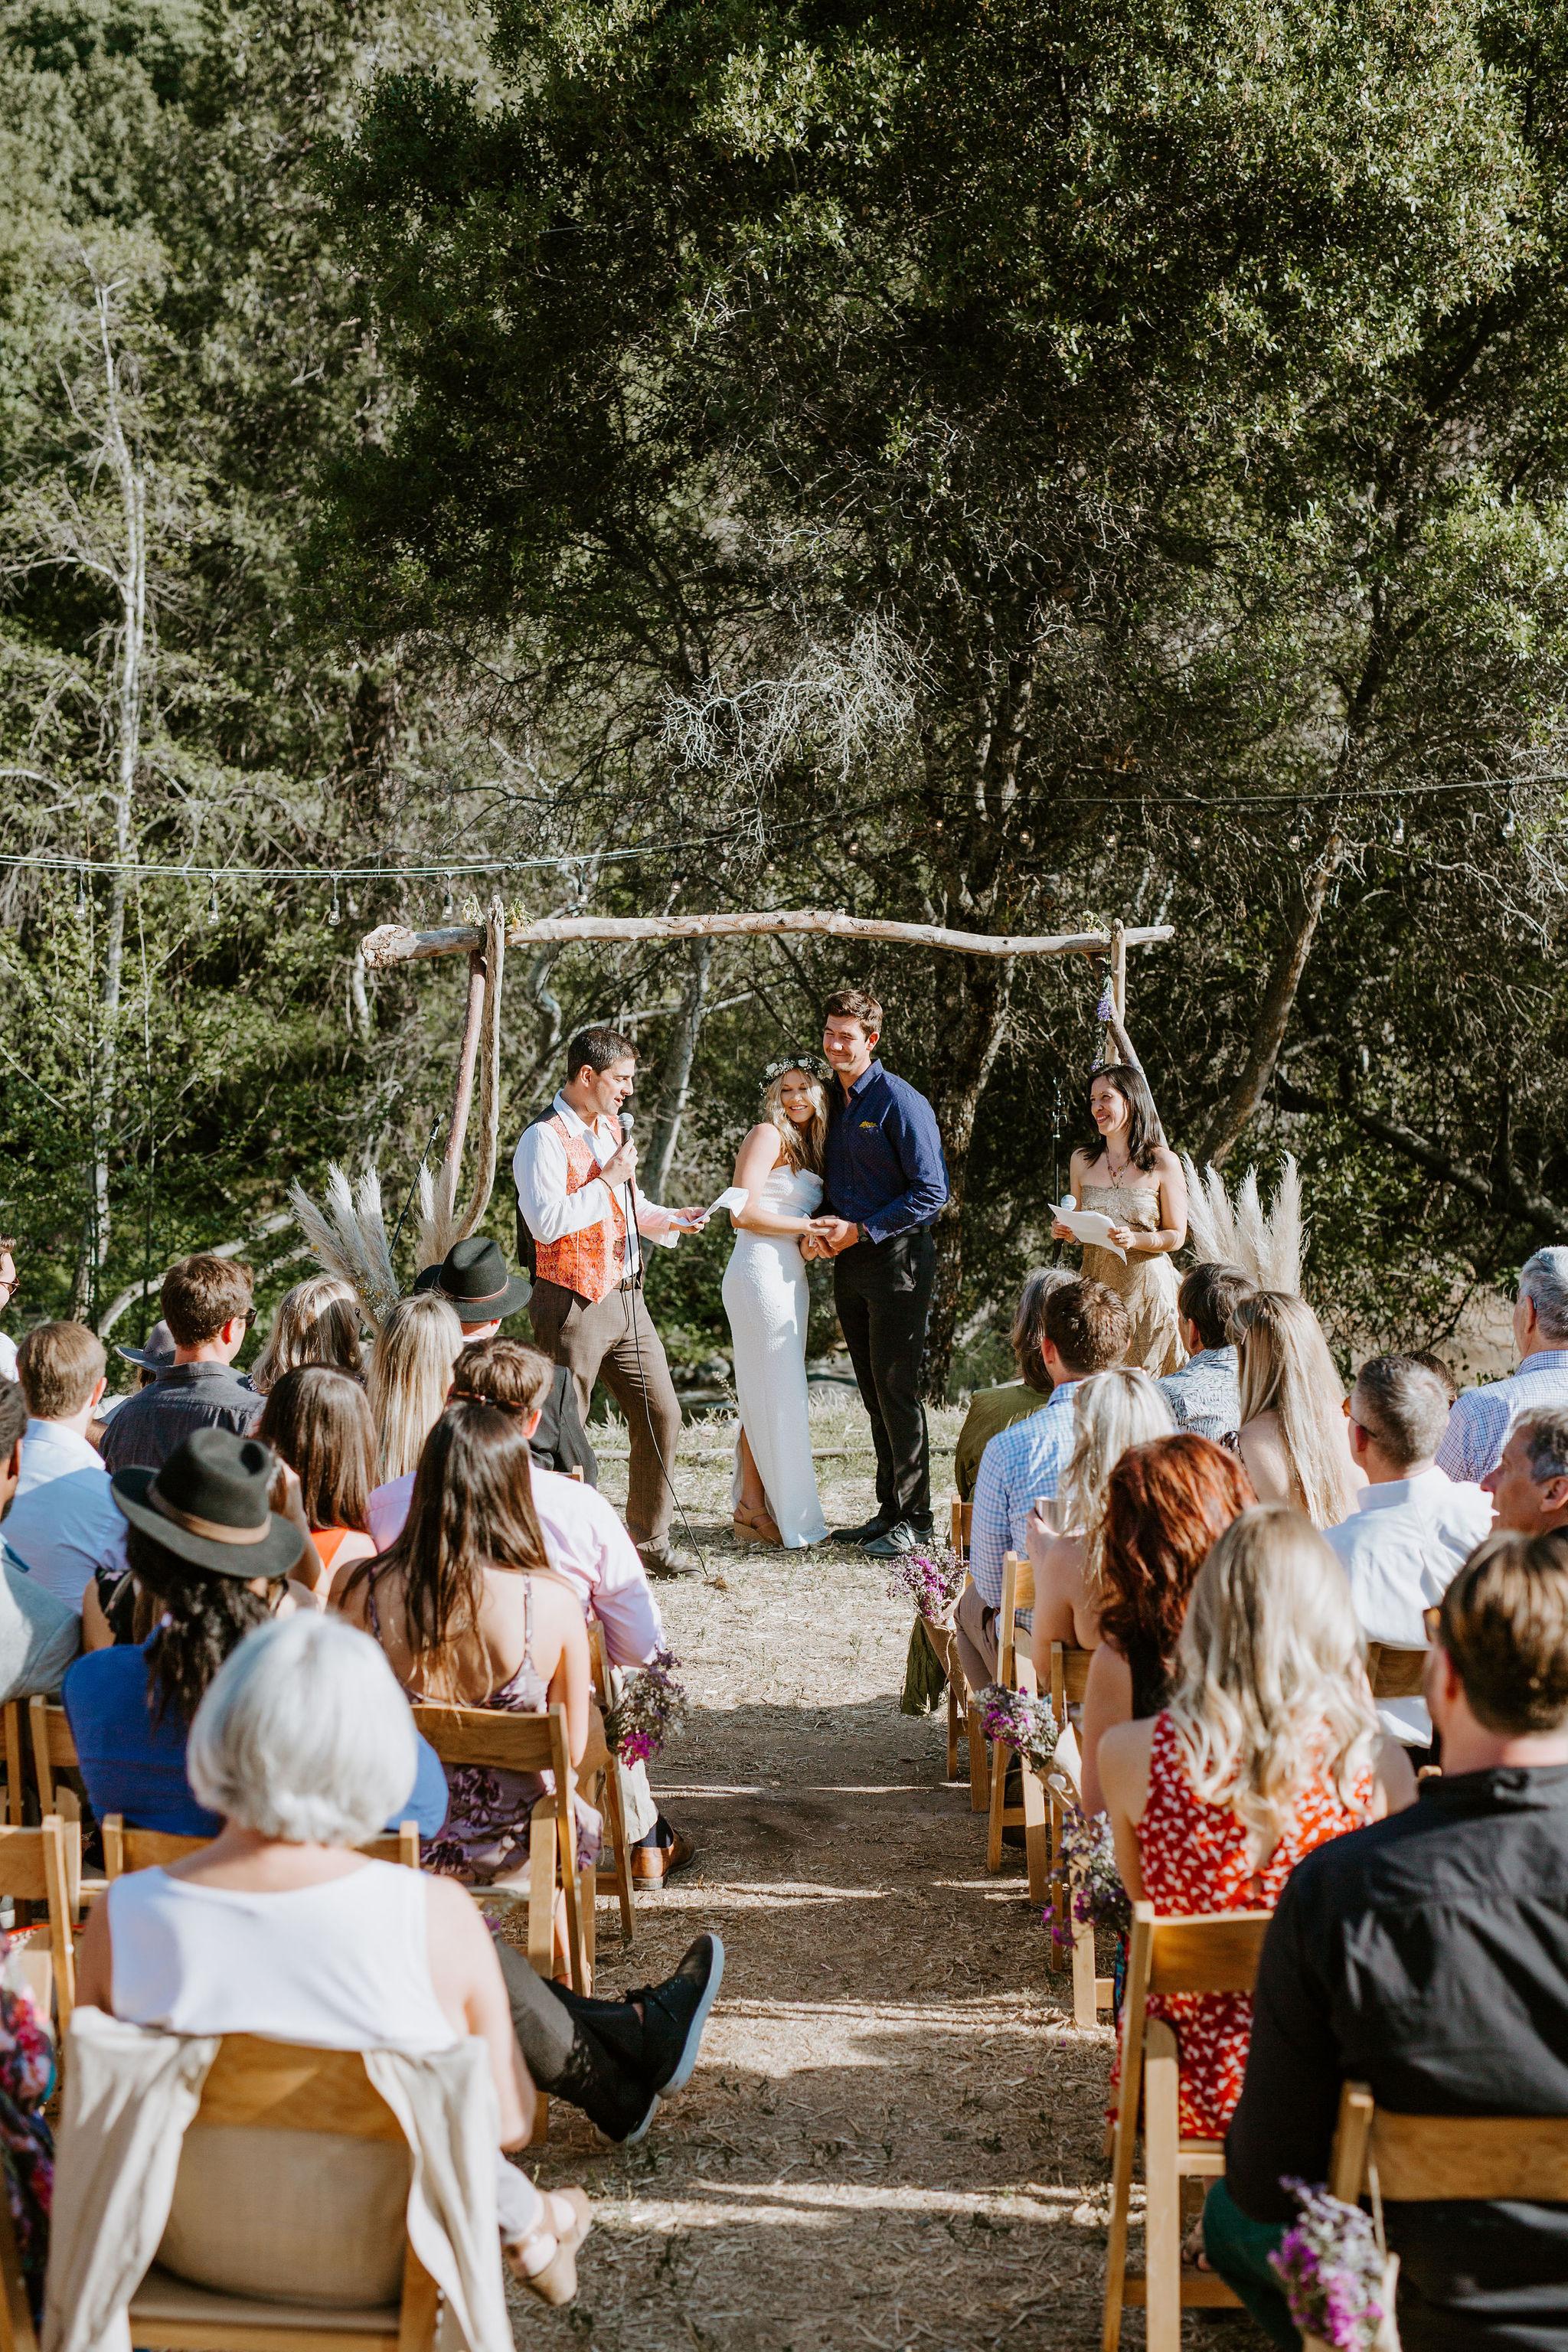 RedwoodRanch_Geoff&LyndsiPhotography_Mike&Amanda_Ceremony73.jpg